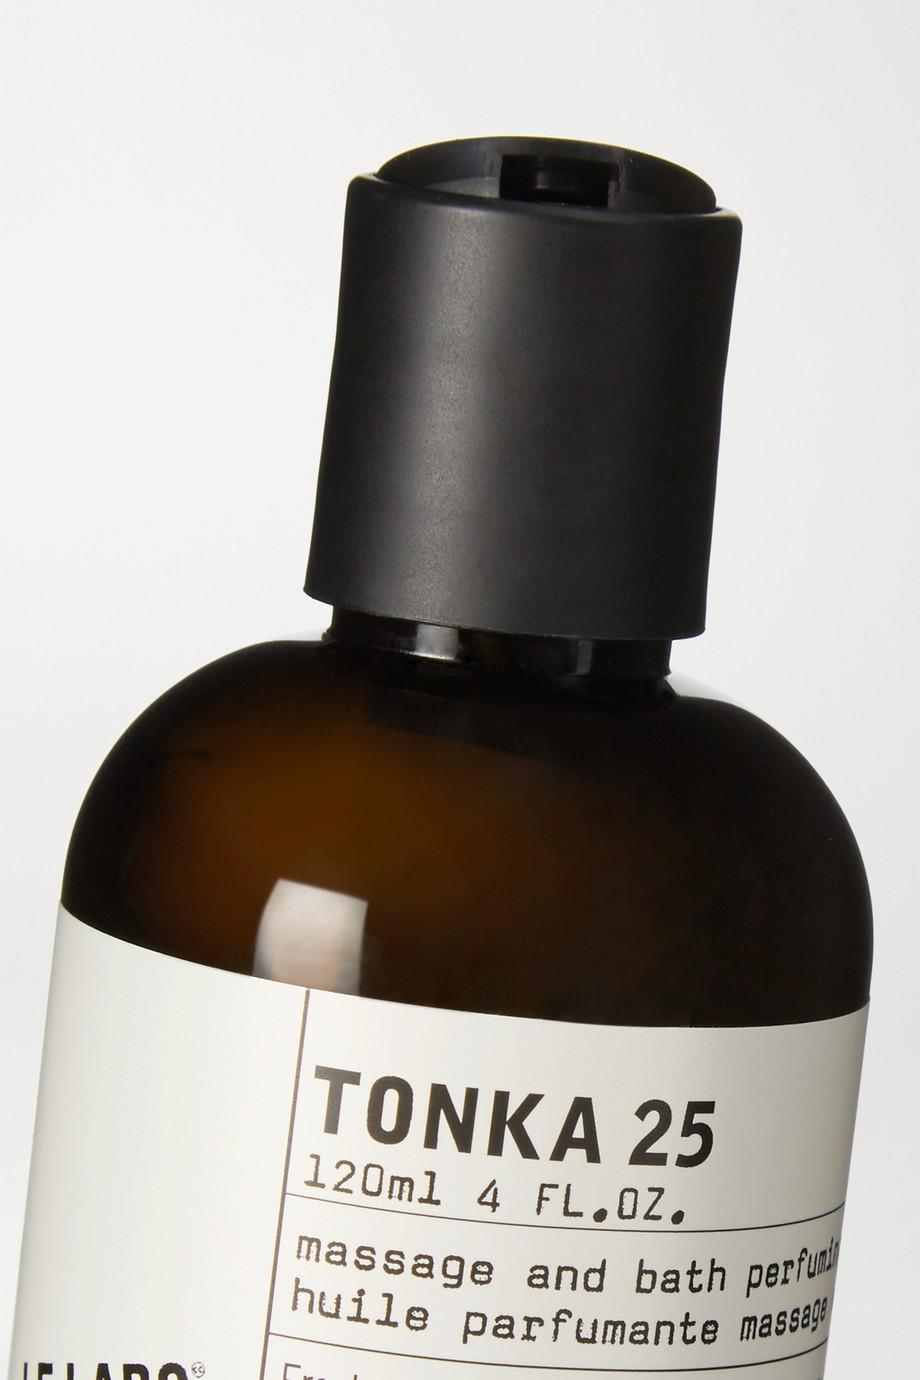 Le Labo Tonka 25 Body Oil, 120ml